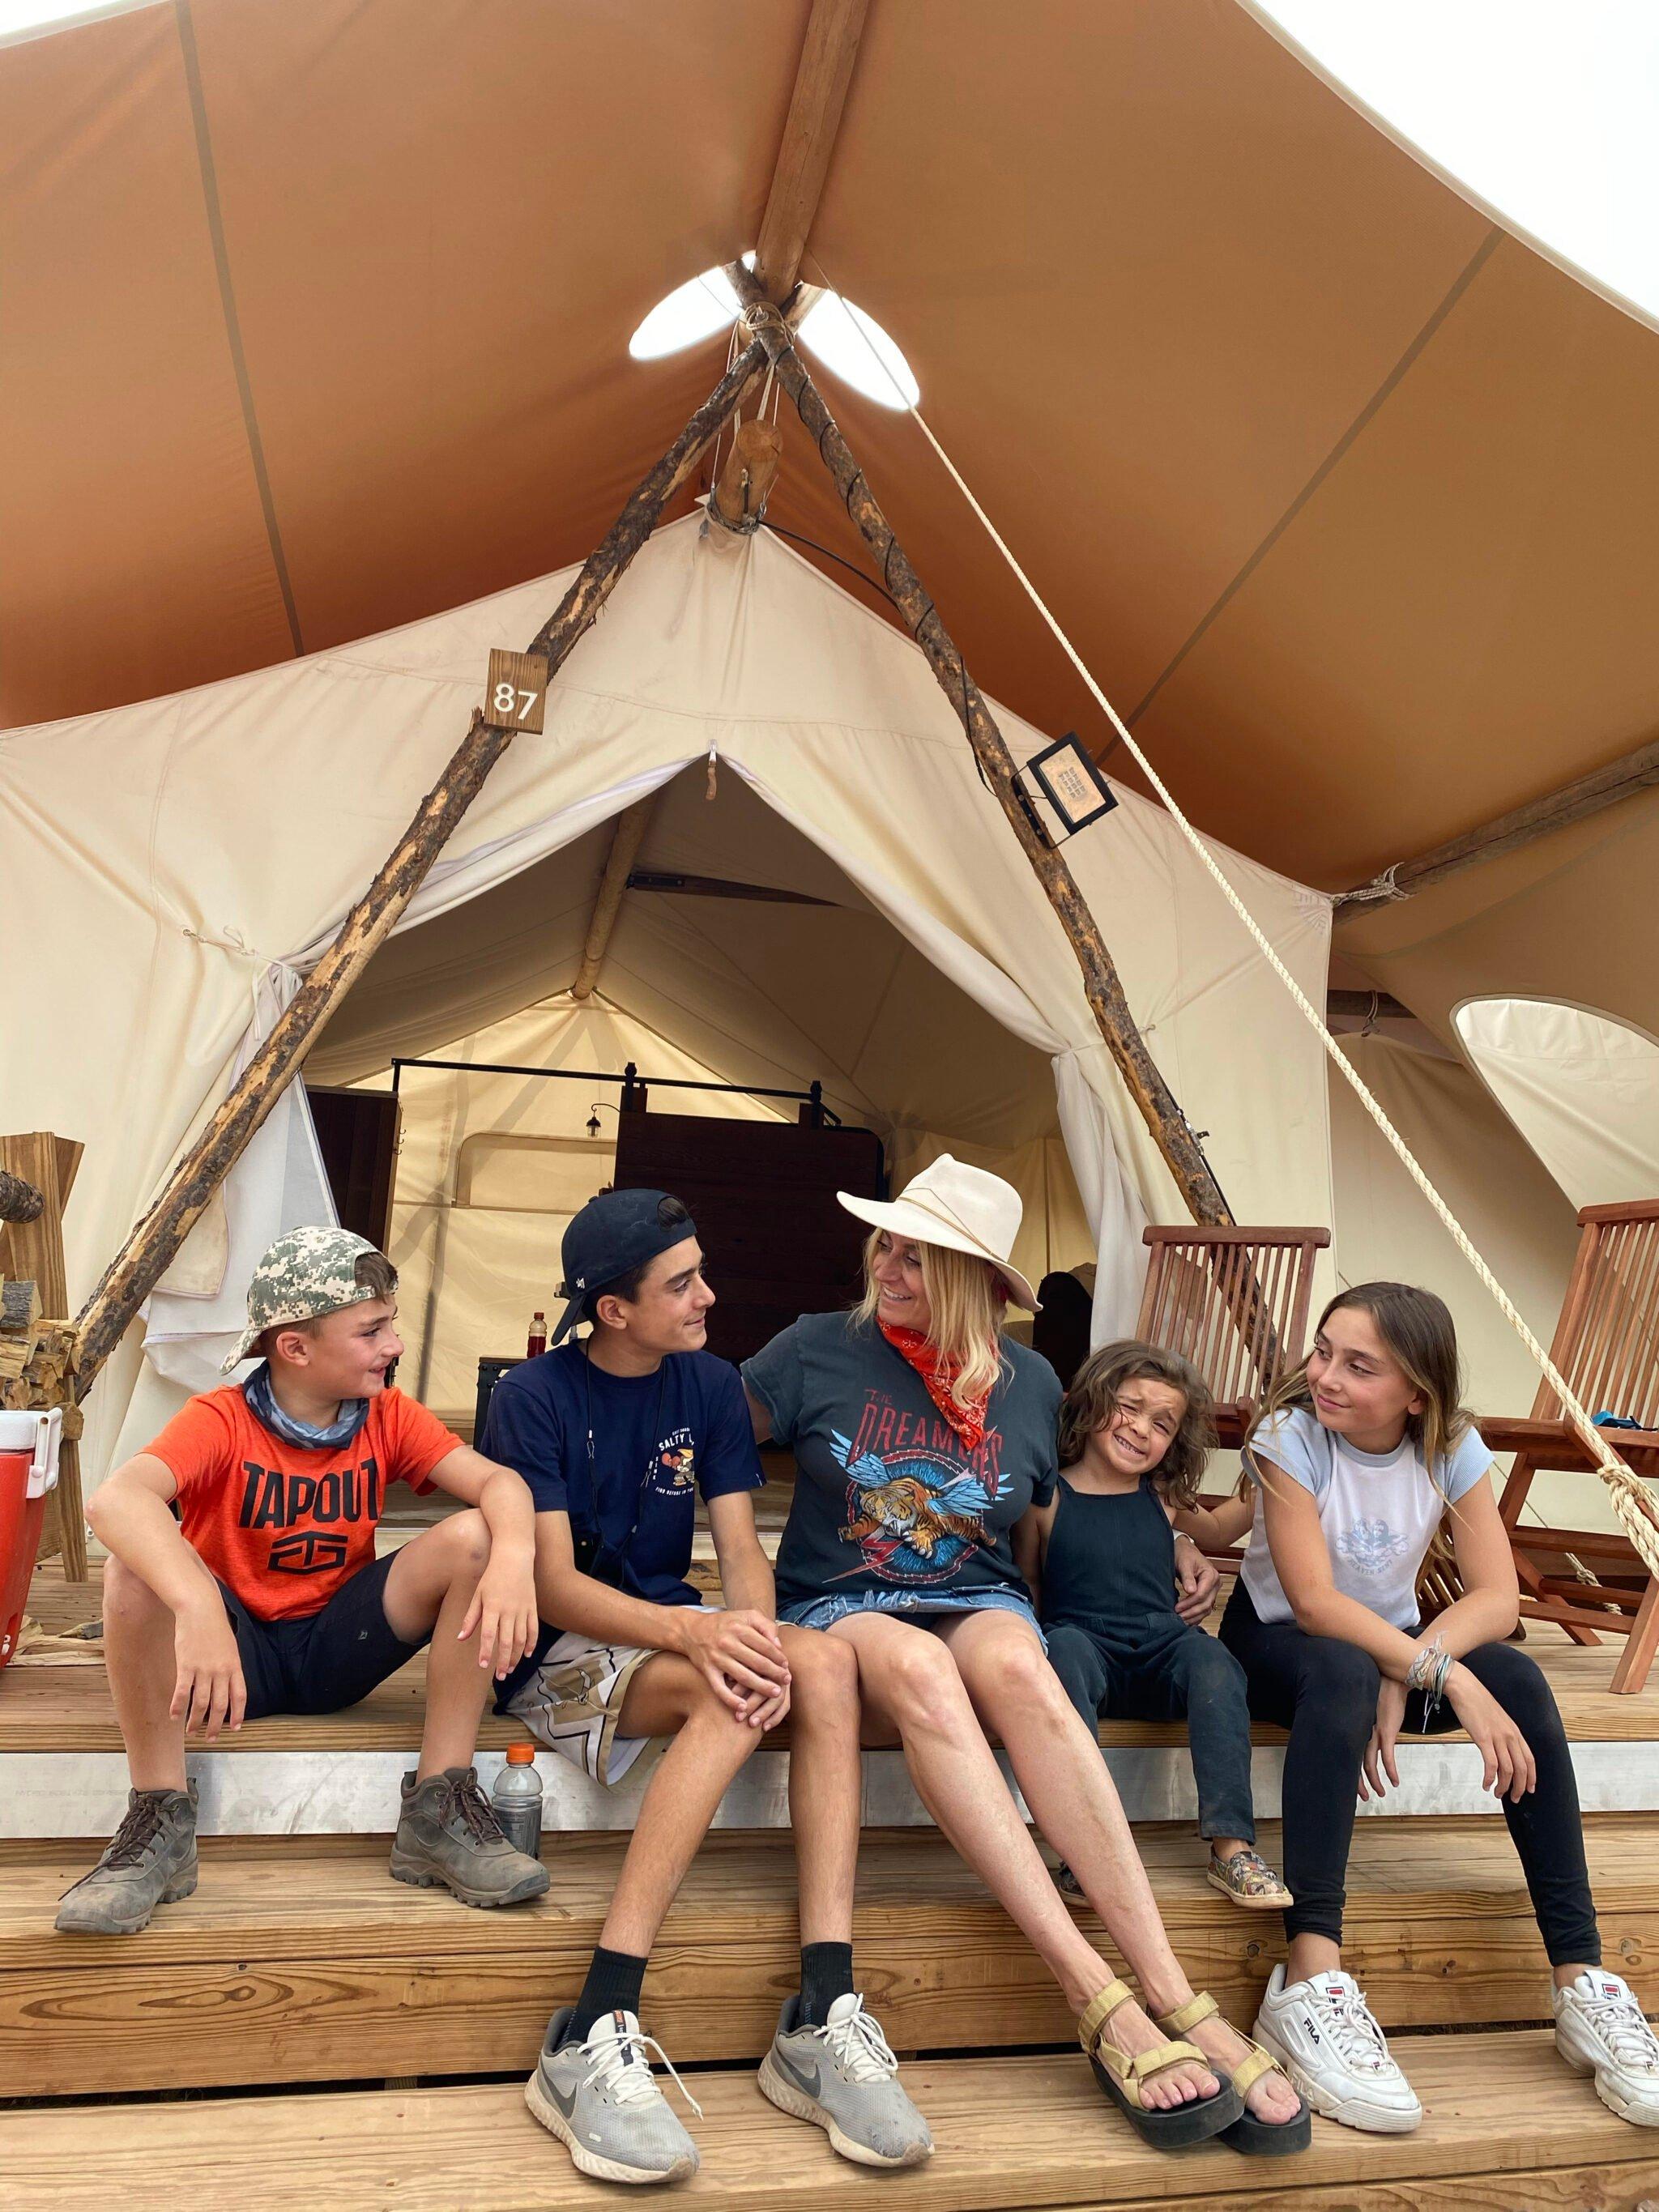 family at camping tent